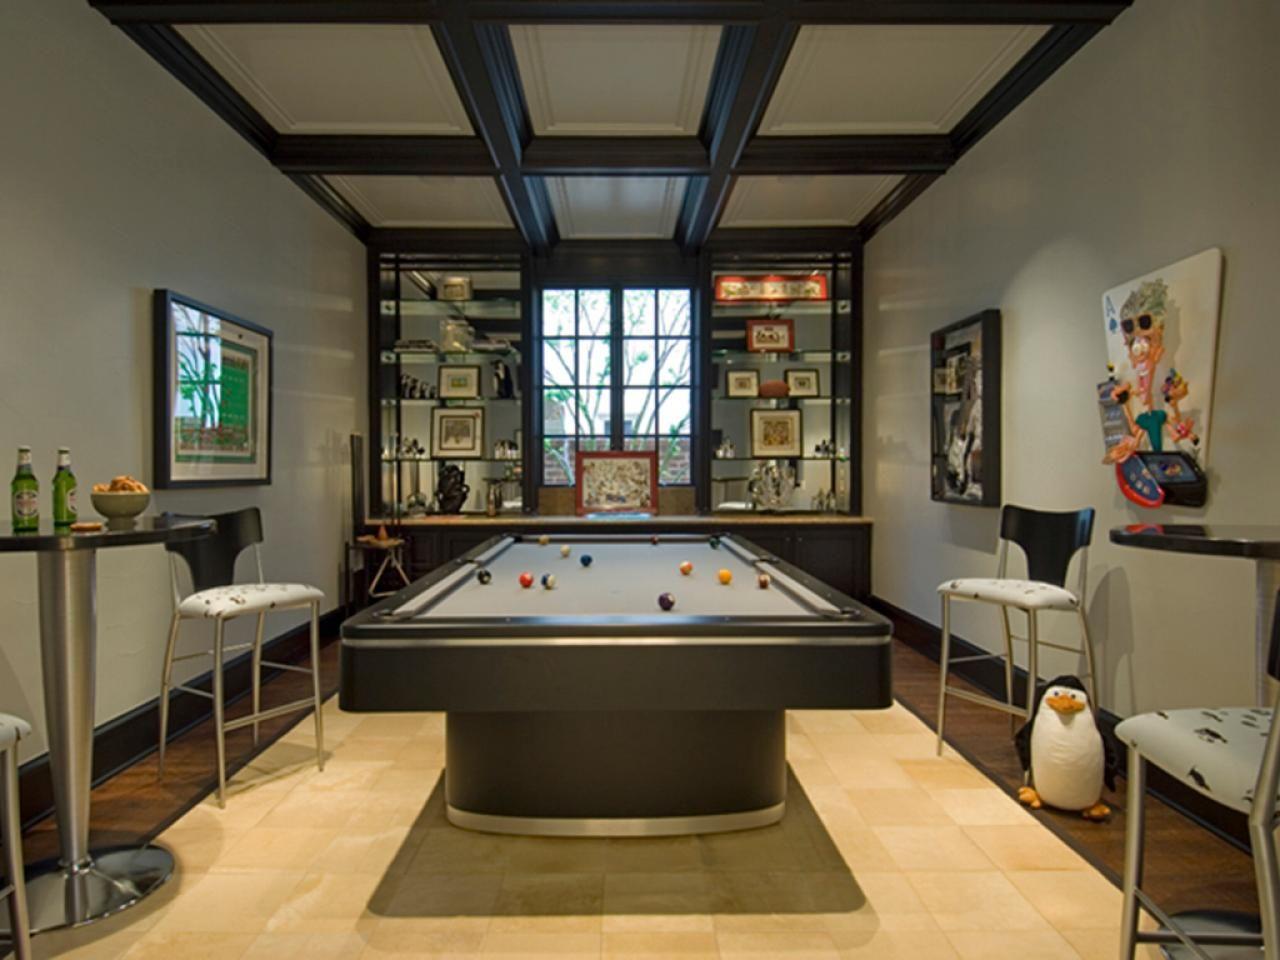 Mary Anne Smiley Highland Park Soft Contemporary 35 Jpg Rend Hgtvcom 1280 960 Jpeg 1280 960 Bonus Room Decorating Pool Table Room Modern Pool House